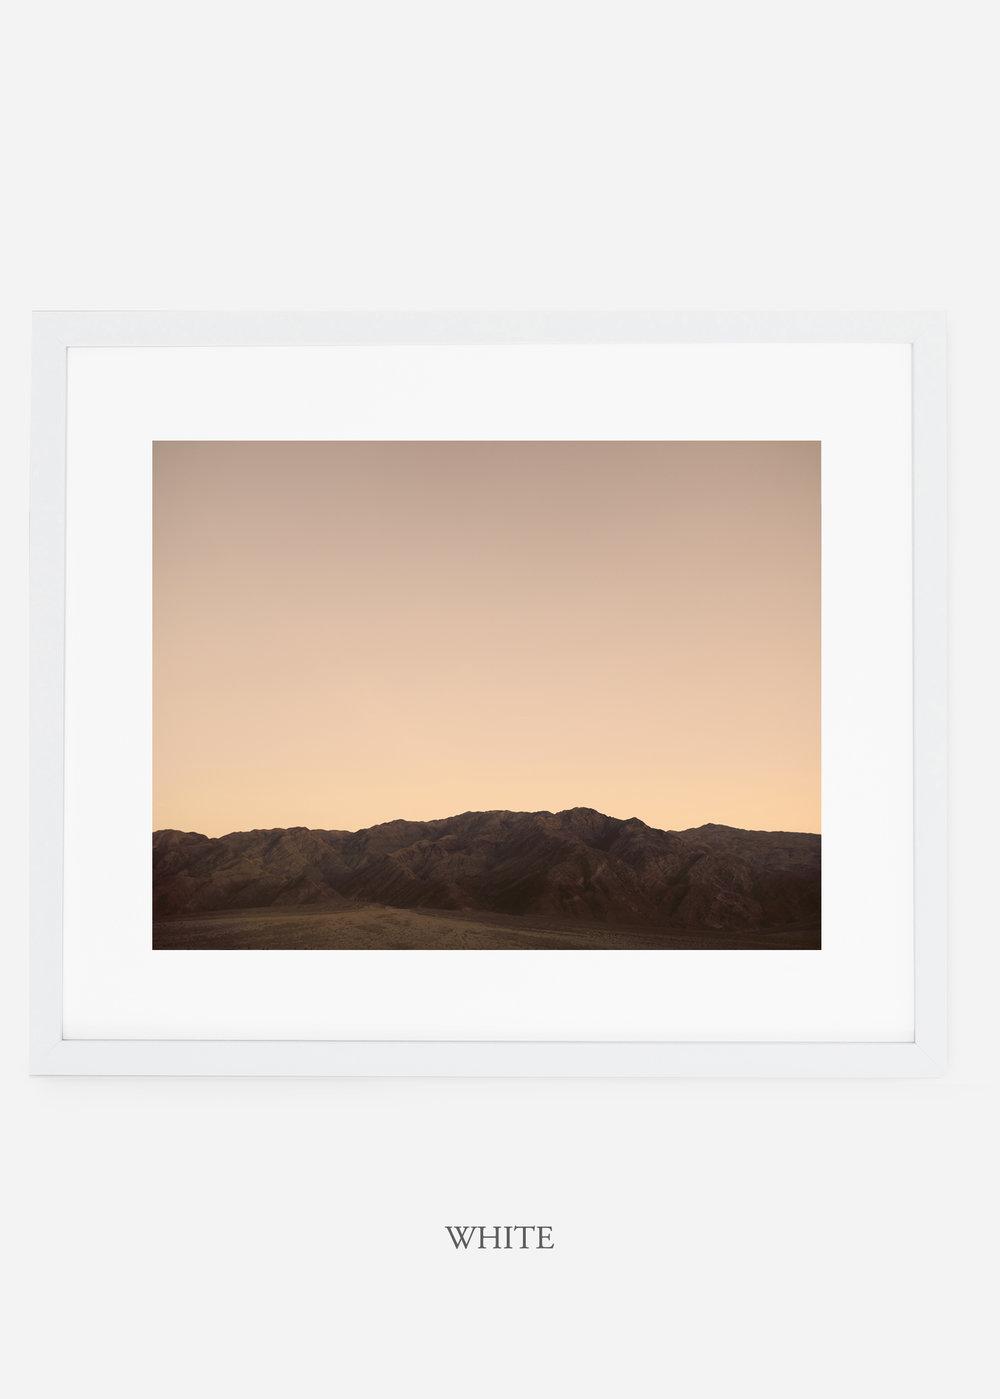 wildercalifornia_whiteframe_deathvalley_5_minimal_cactus_art_interiordesign_blackandwhite.jpg